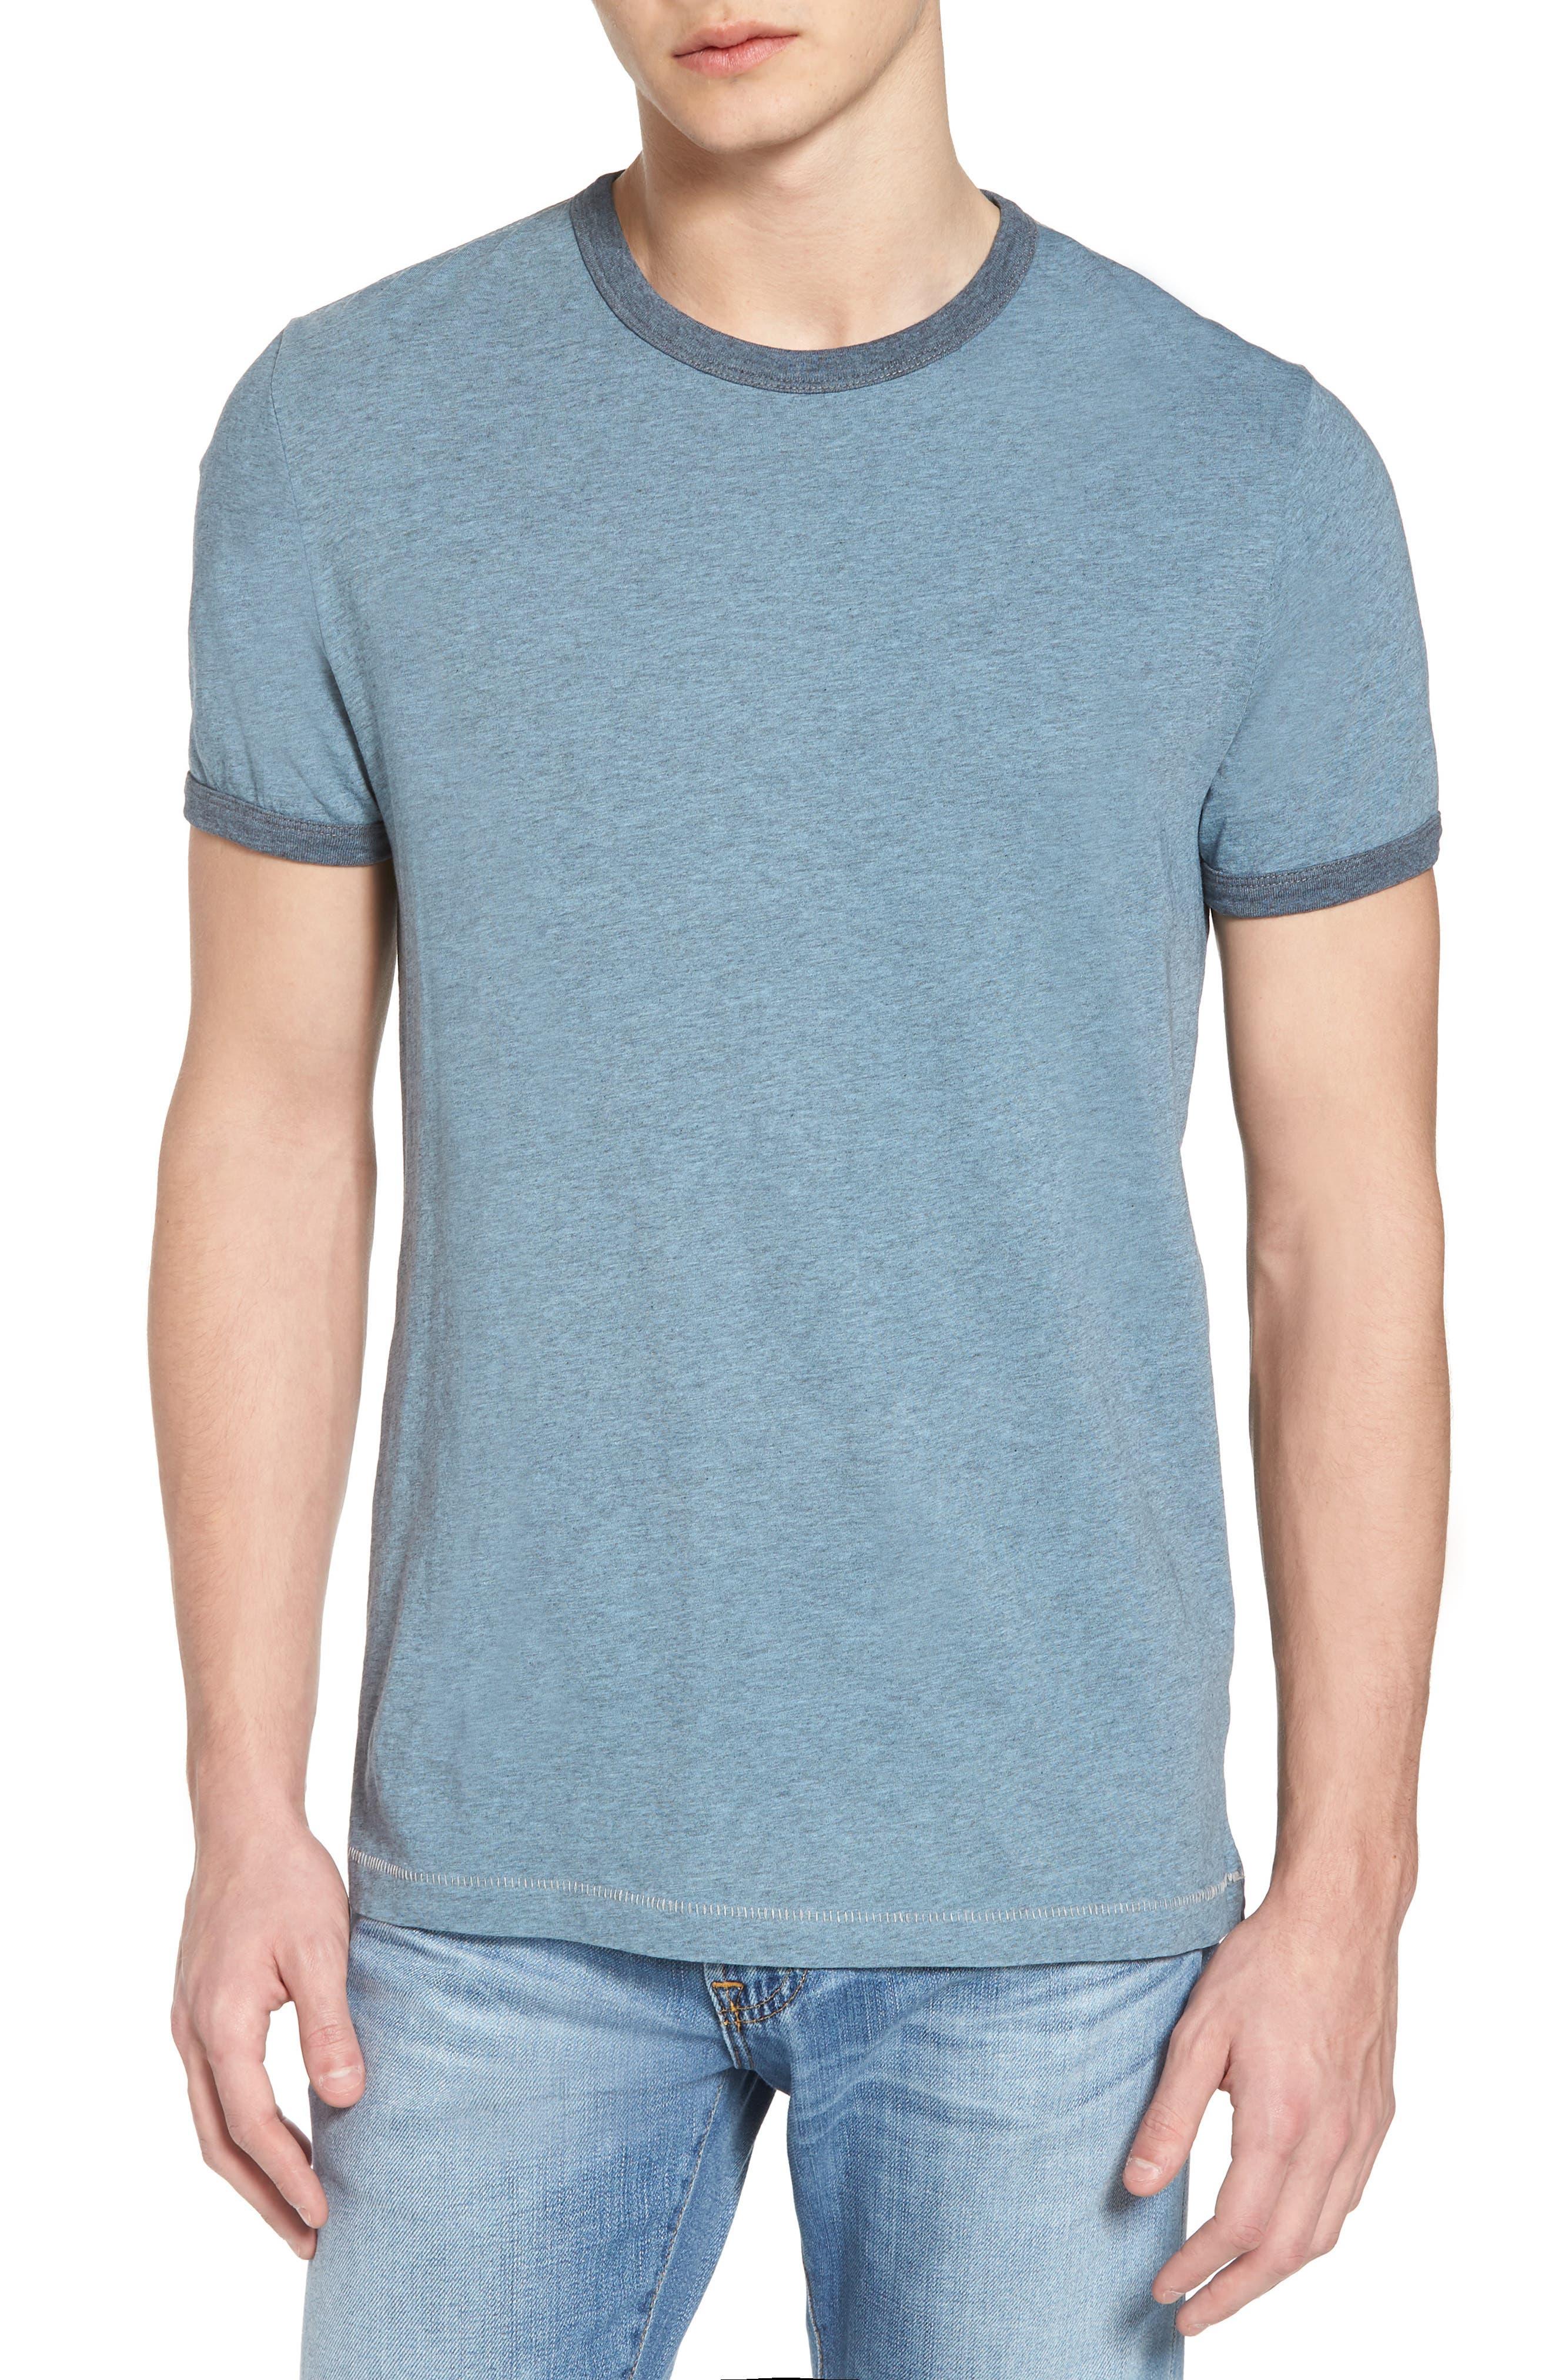 Bens Slim Fit Ringer T-Shirt,                             Main thumbnail 1, color,                             Overdyed Ashley Blue